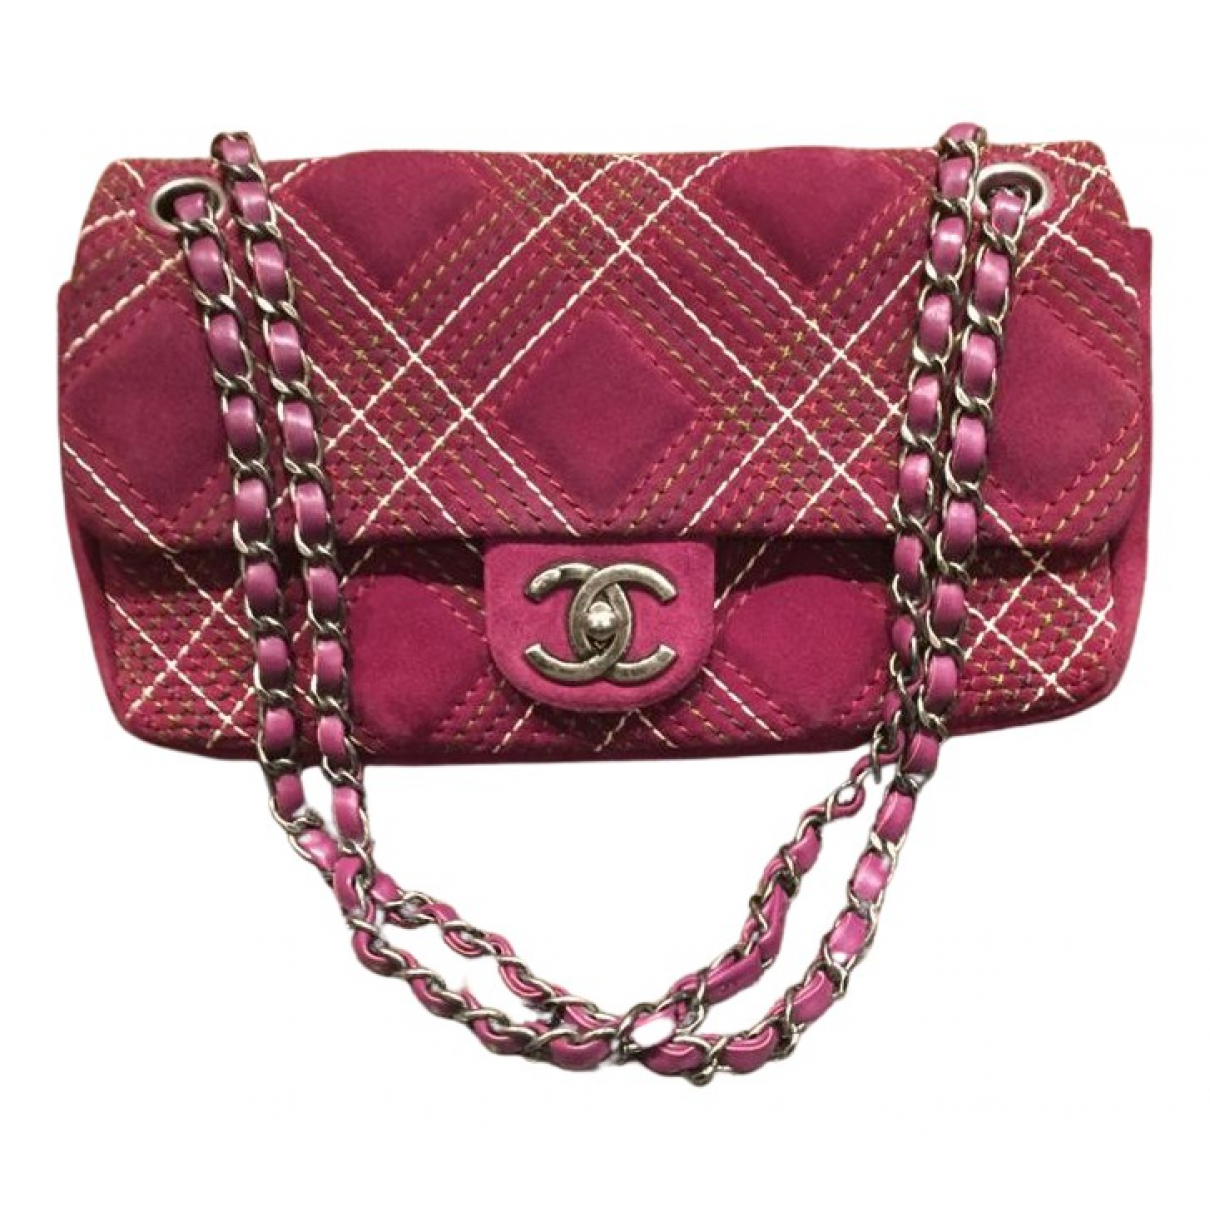 Chanel Timeless/Classique Handtasche in  Bordeauxrot Veloursleder